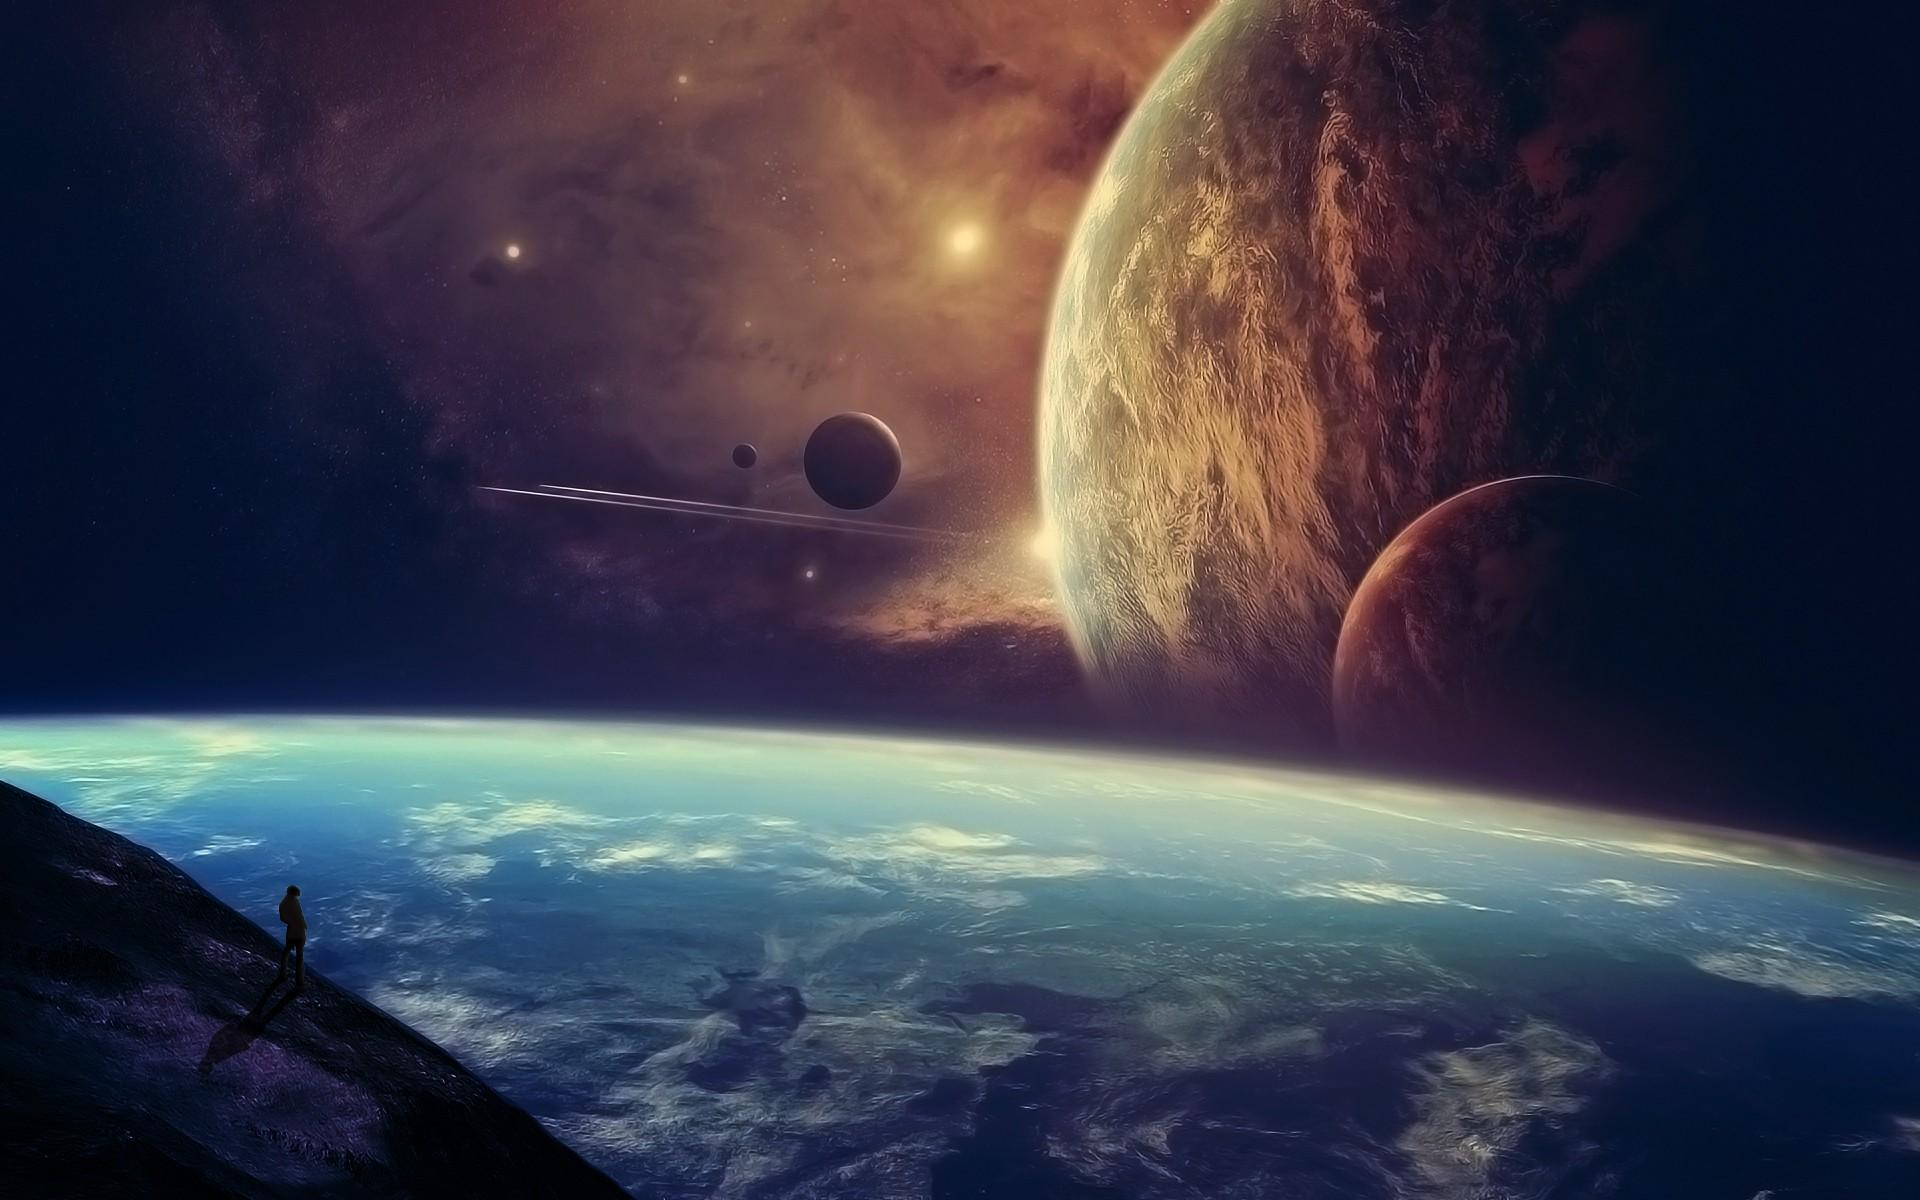 Fantasy space earth